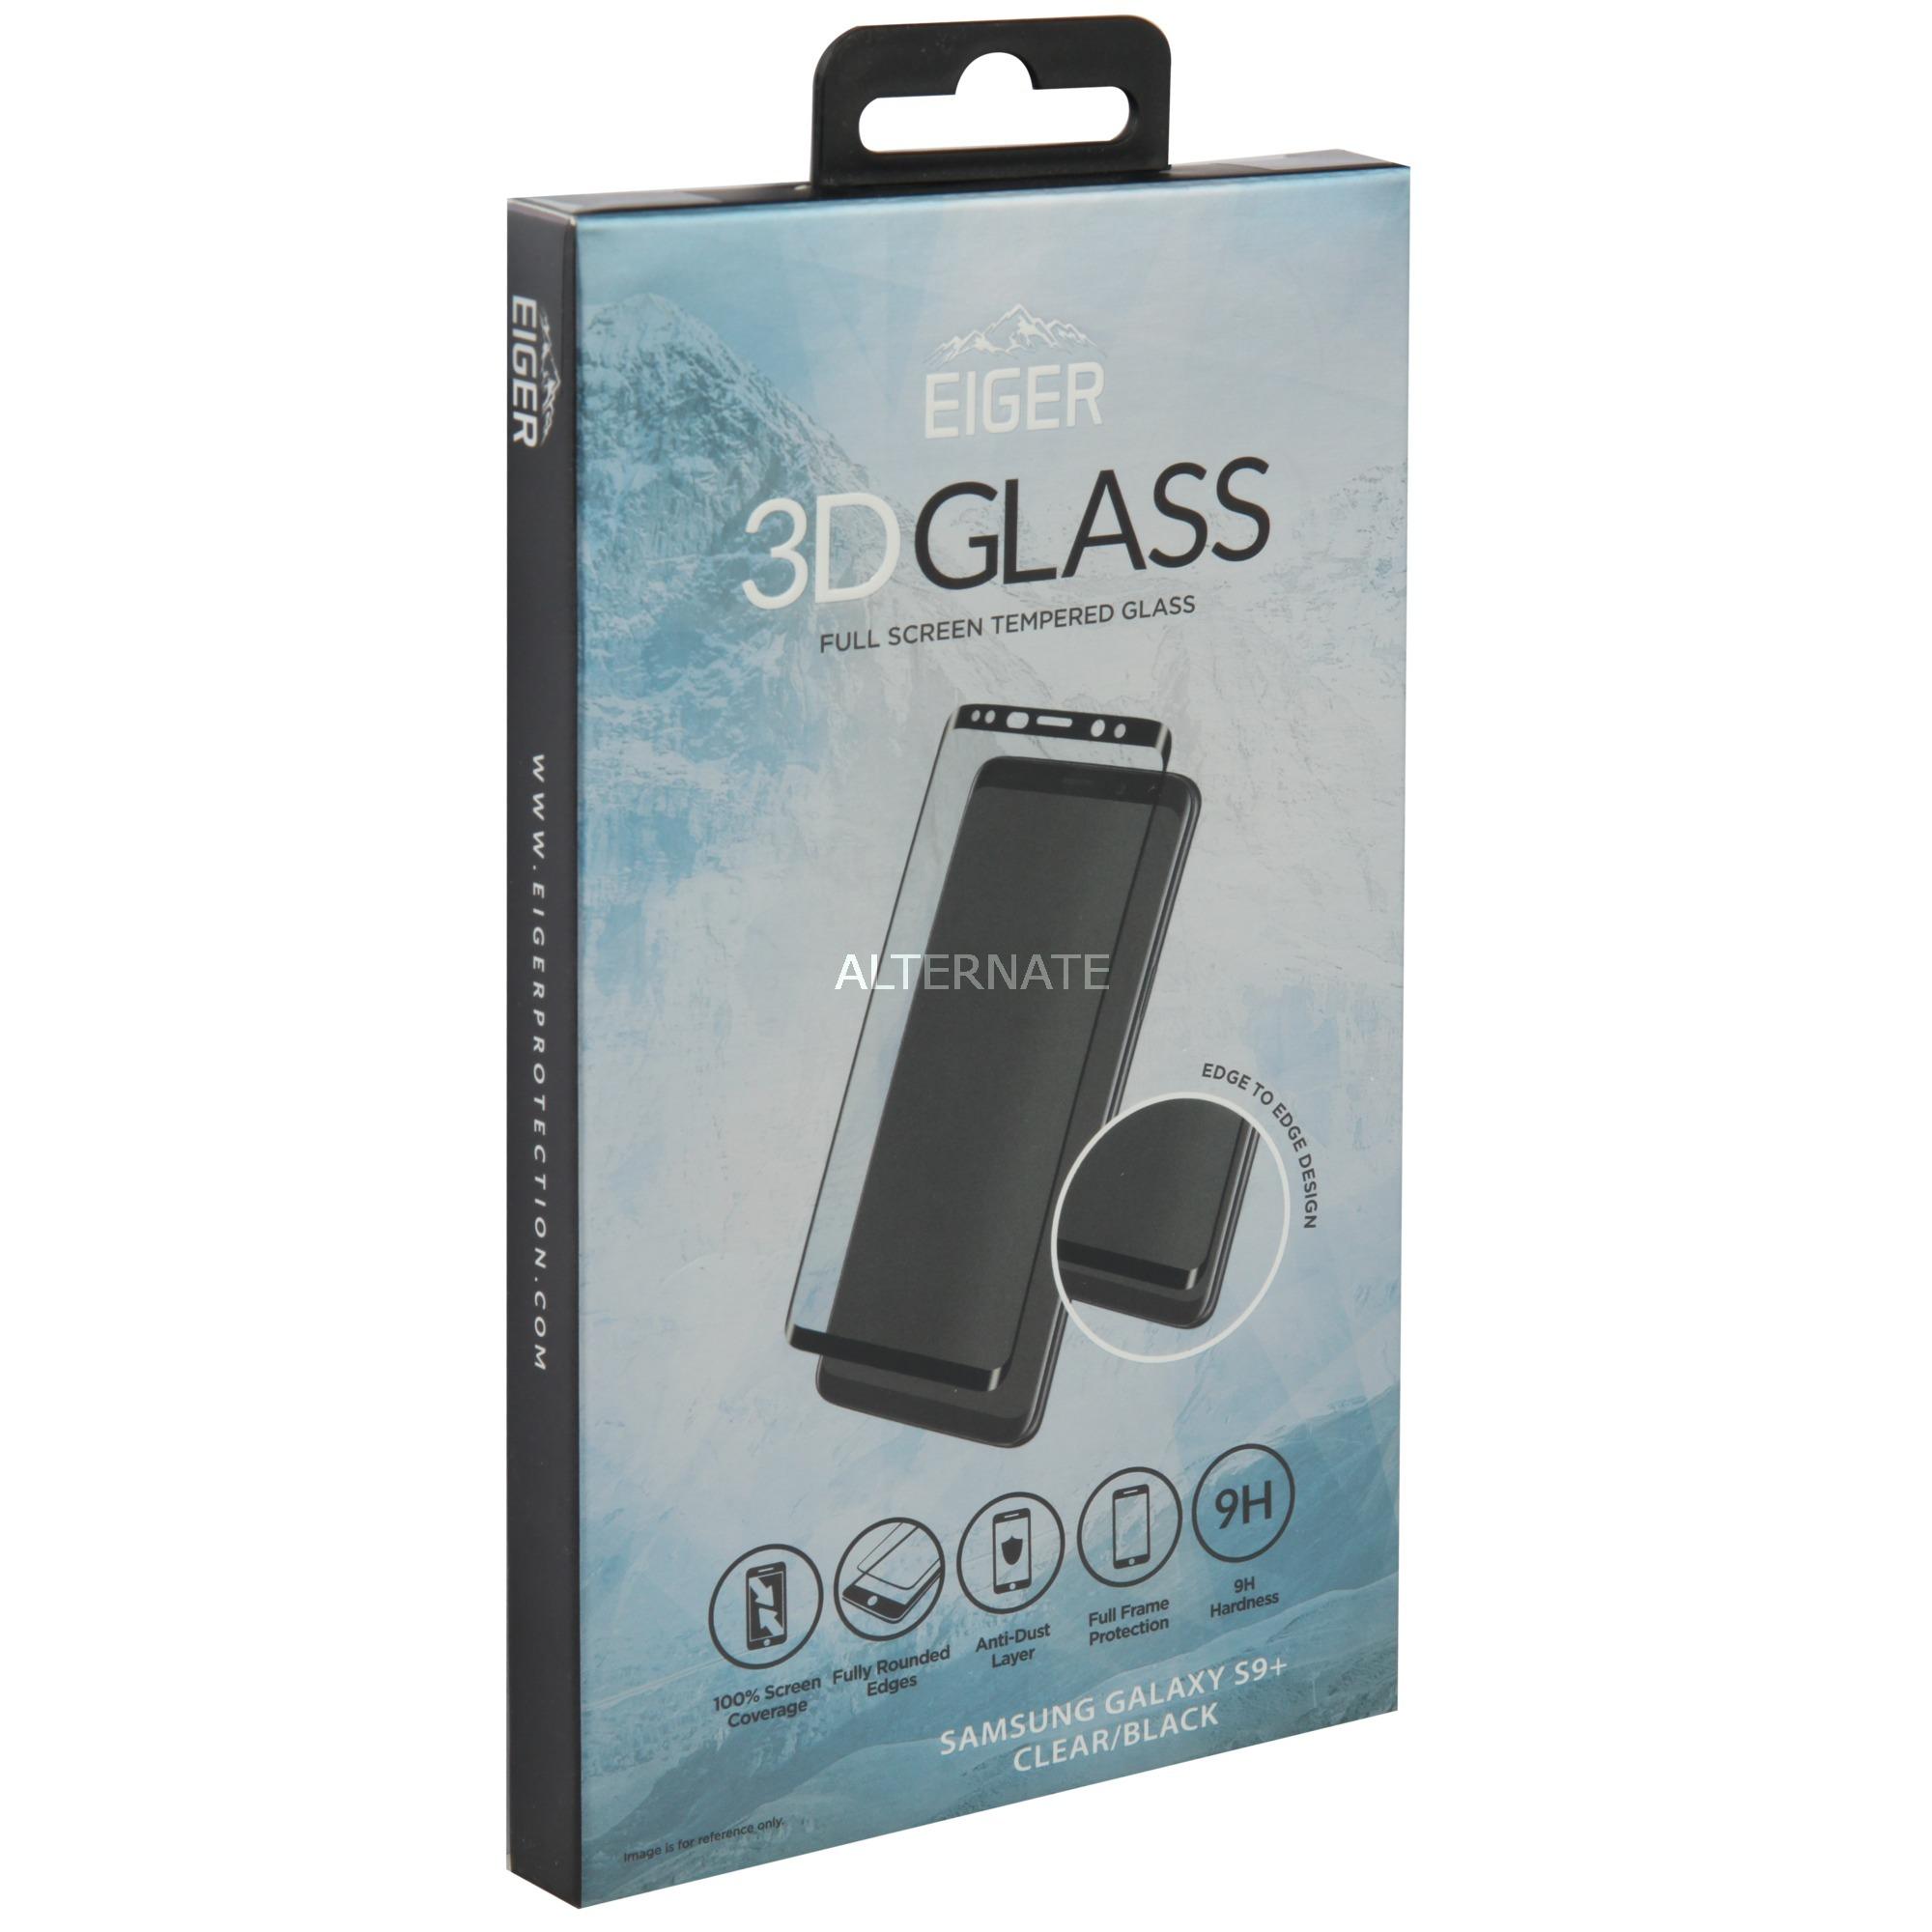 3D GLASS Protector de pantalla Samsung Galaxy S9+ 1 pieza(s), Película protectora